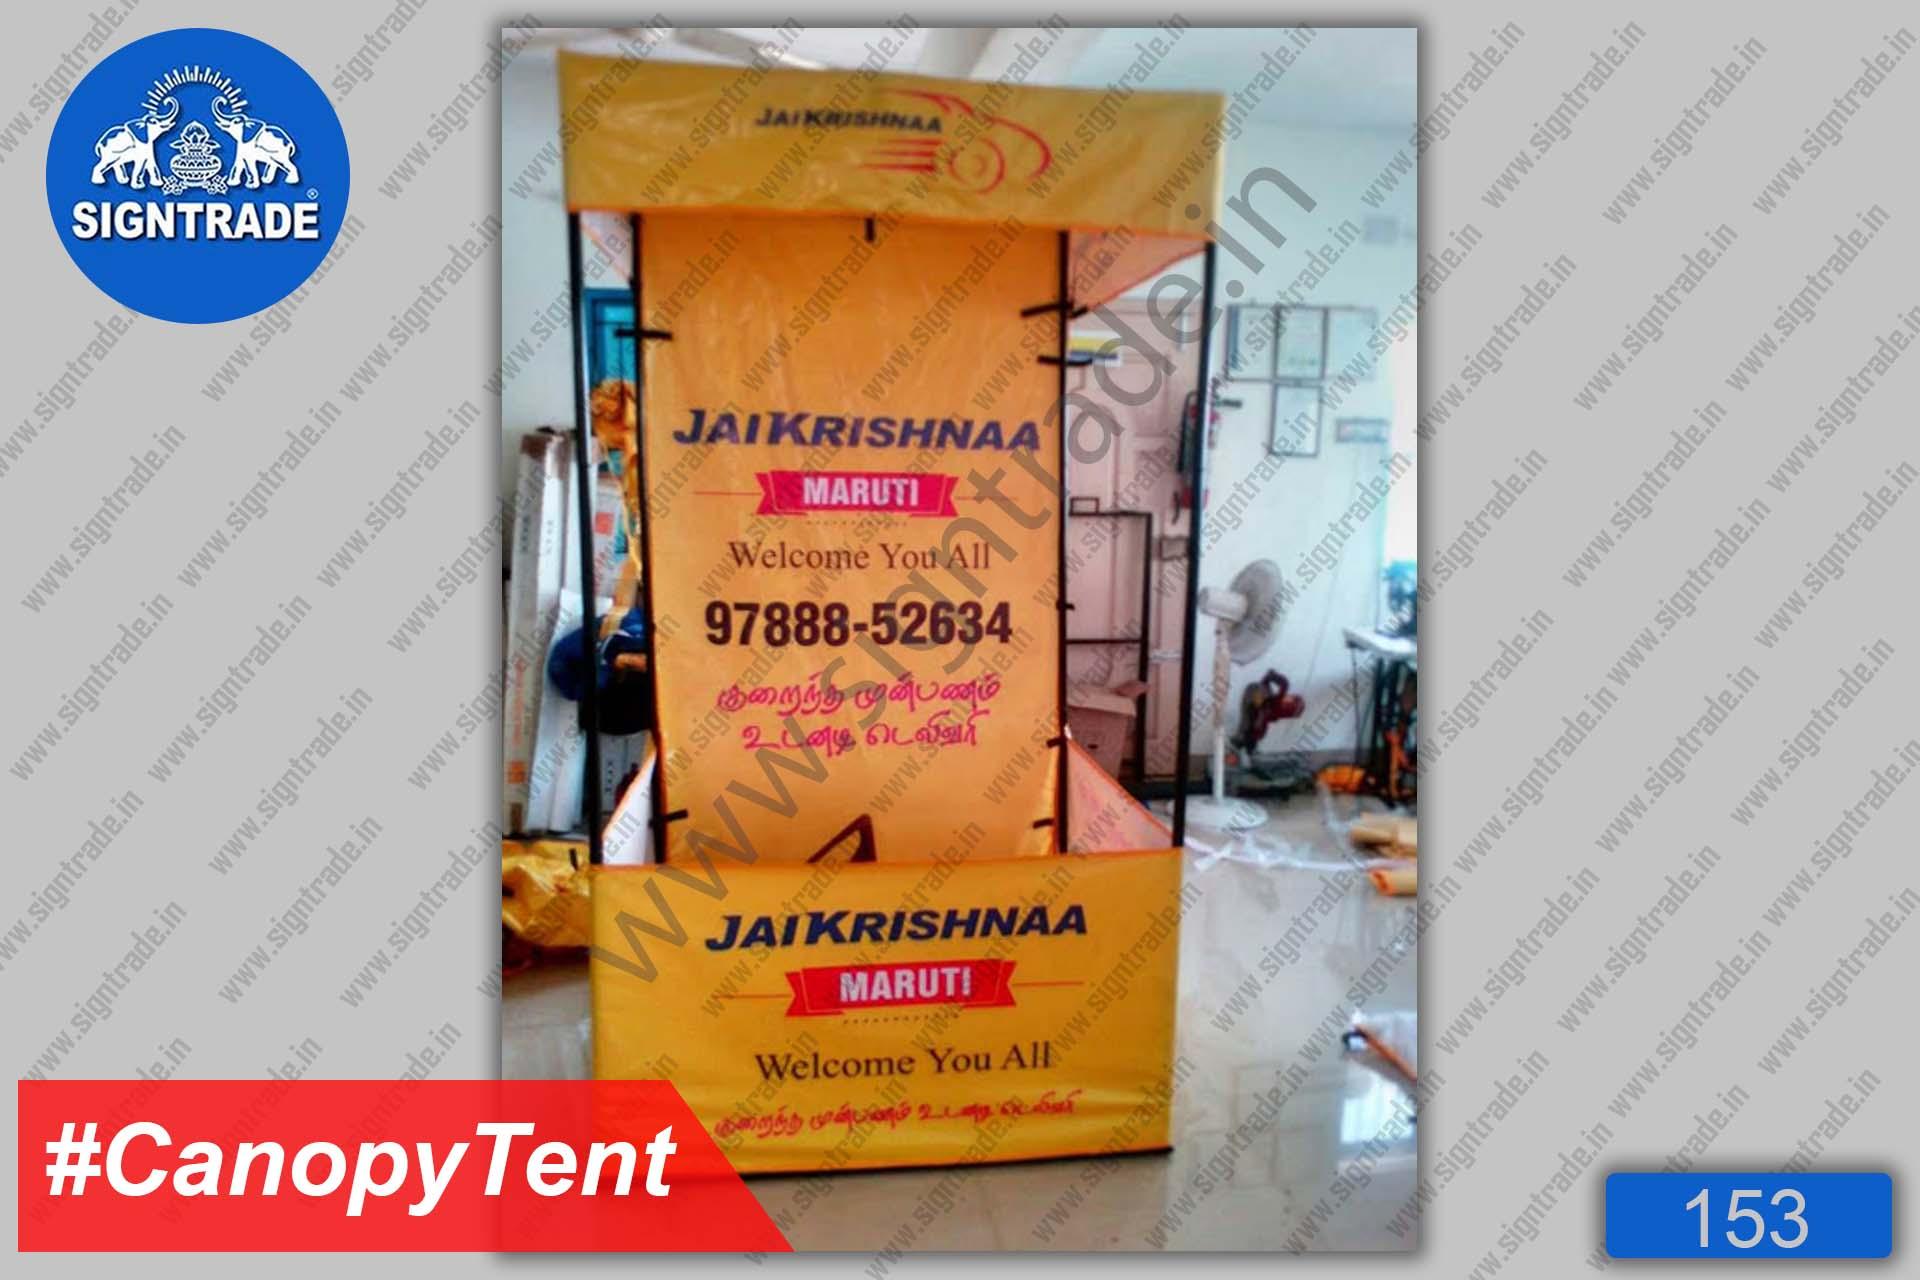 Flat Roof Tent, Canopy Tent - Jaikrishnaa Maruti